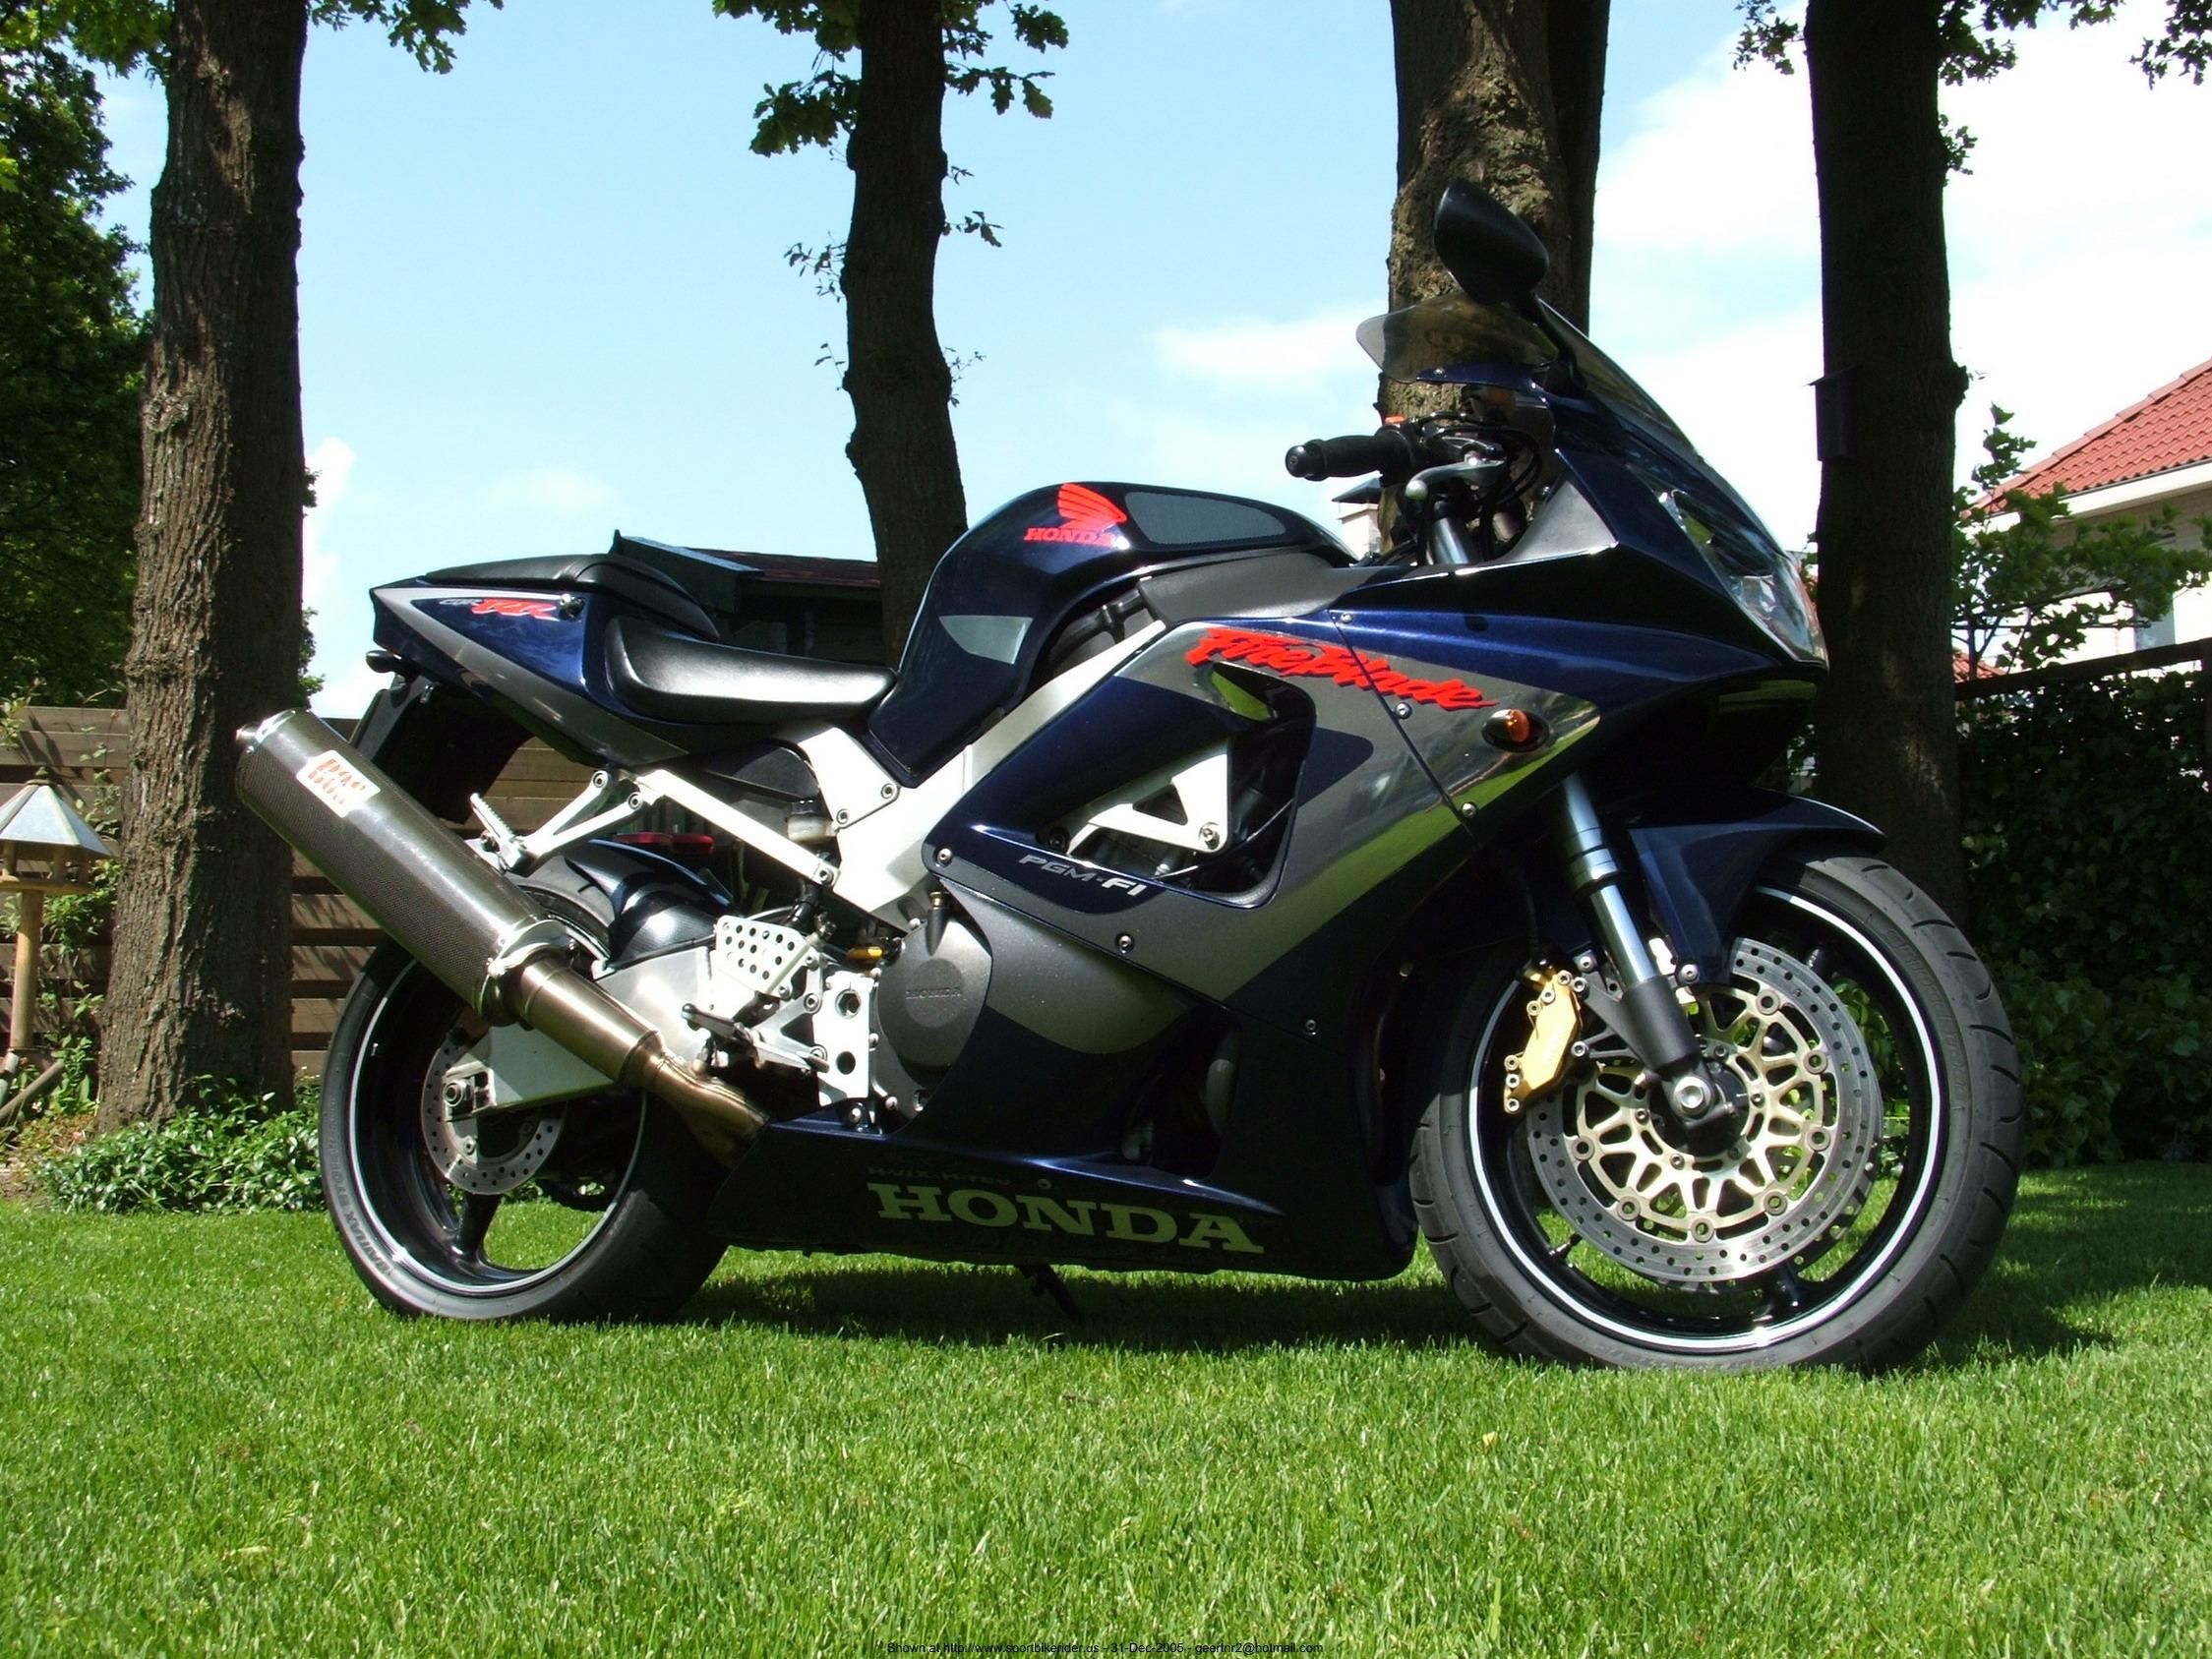 2001 CBR 929/954 RR